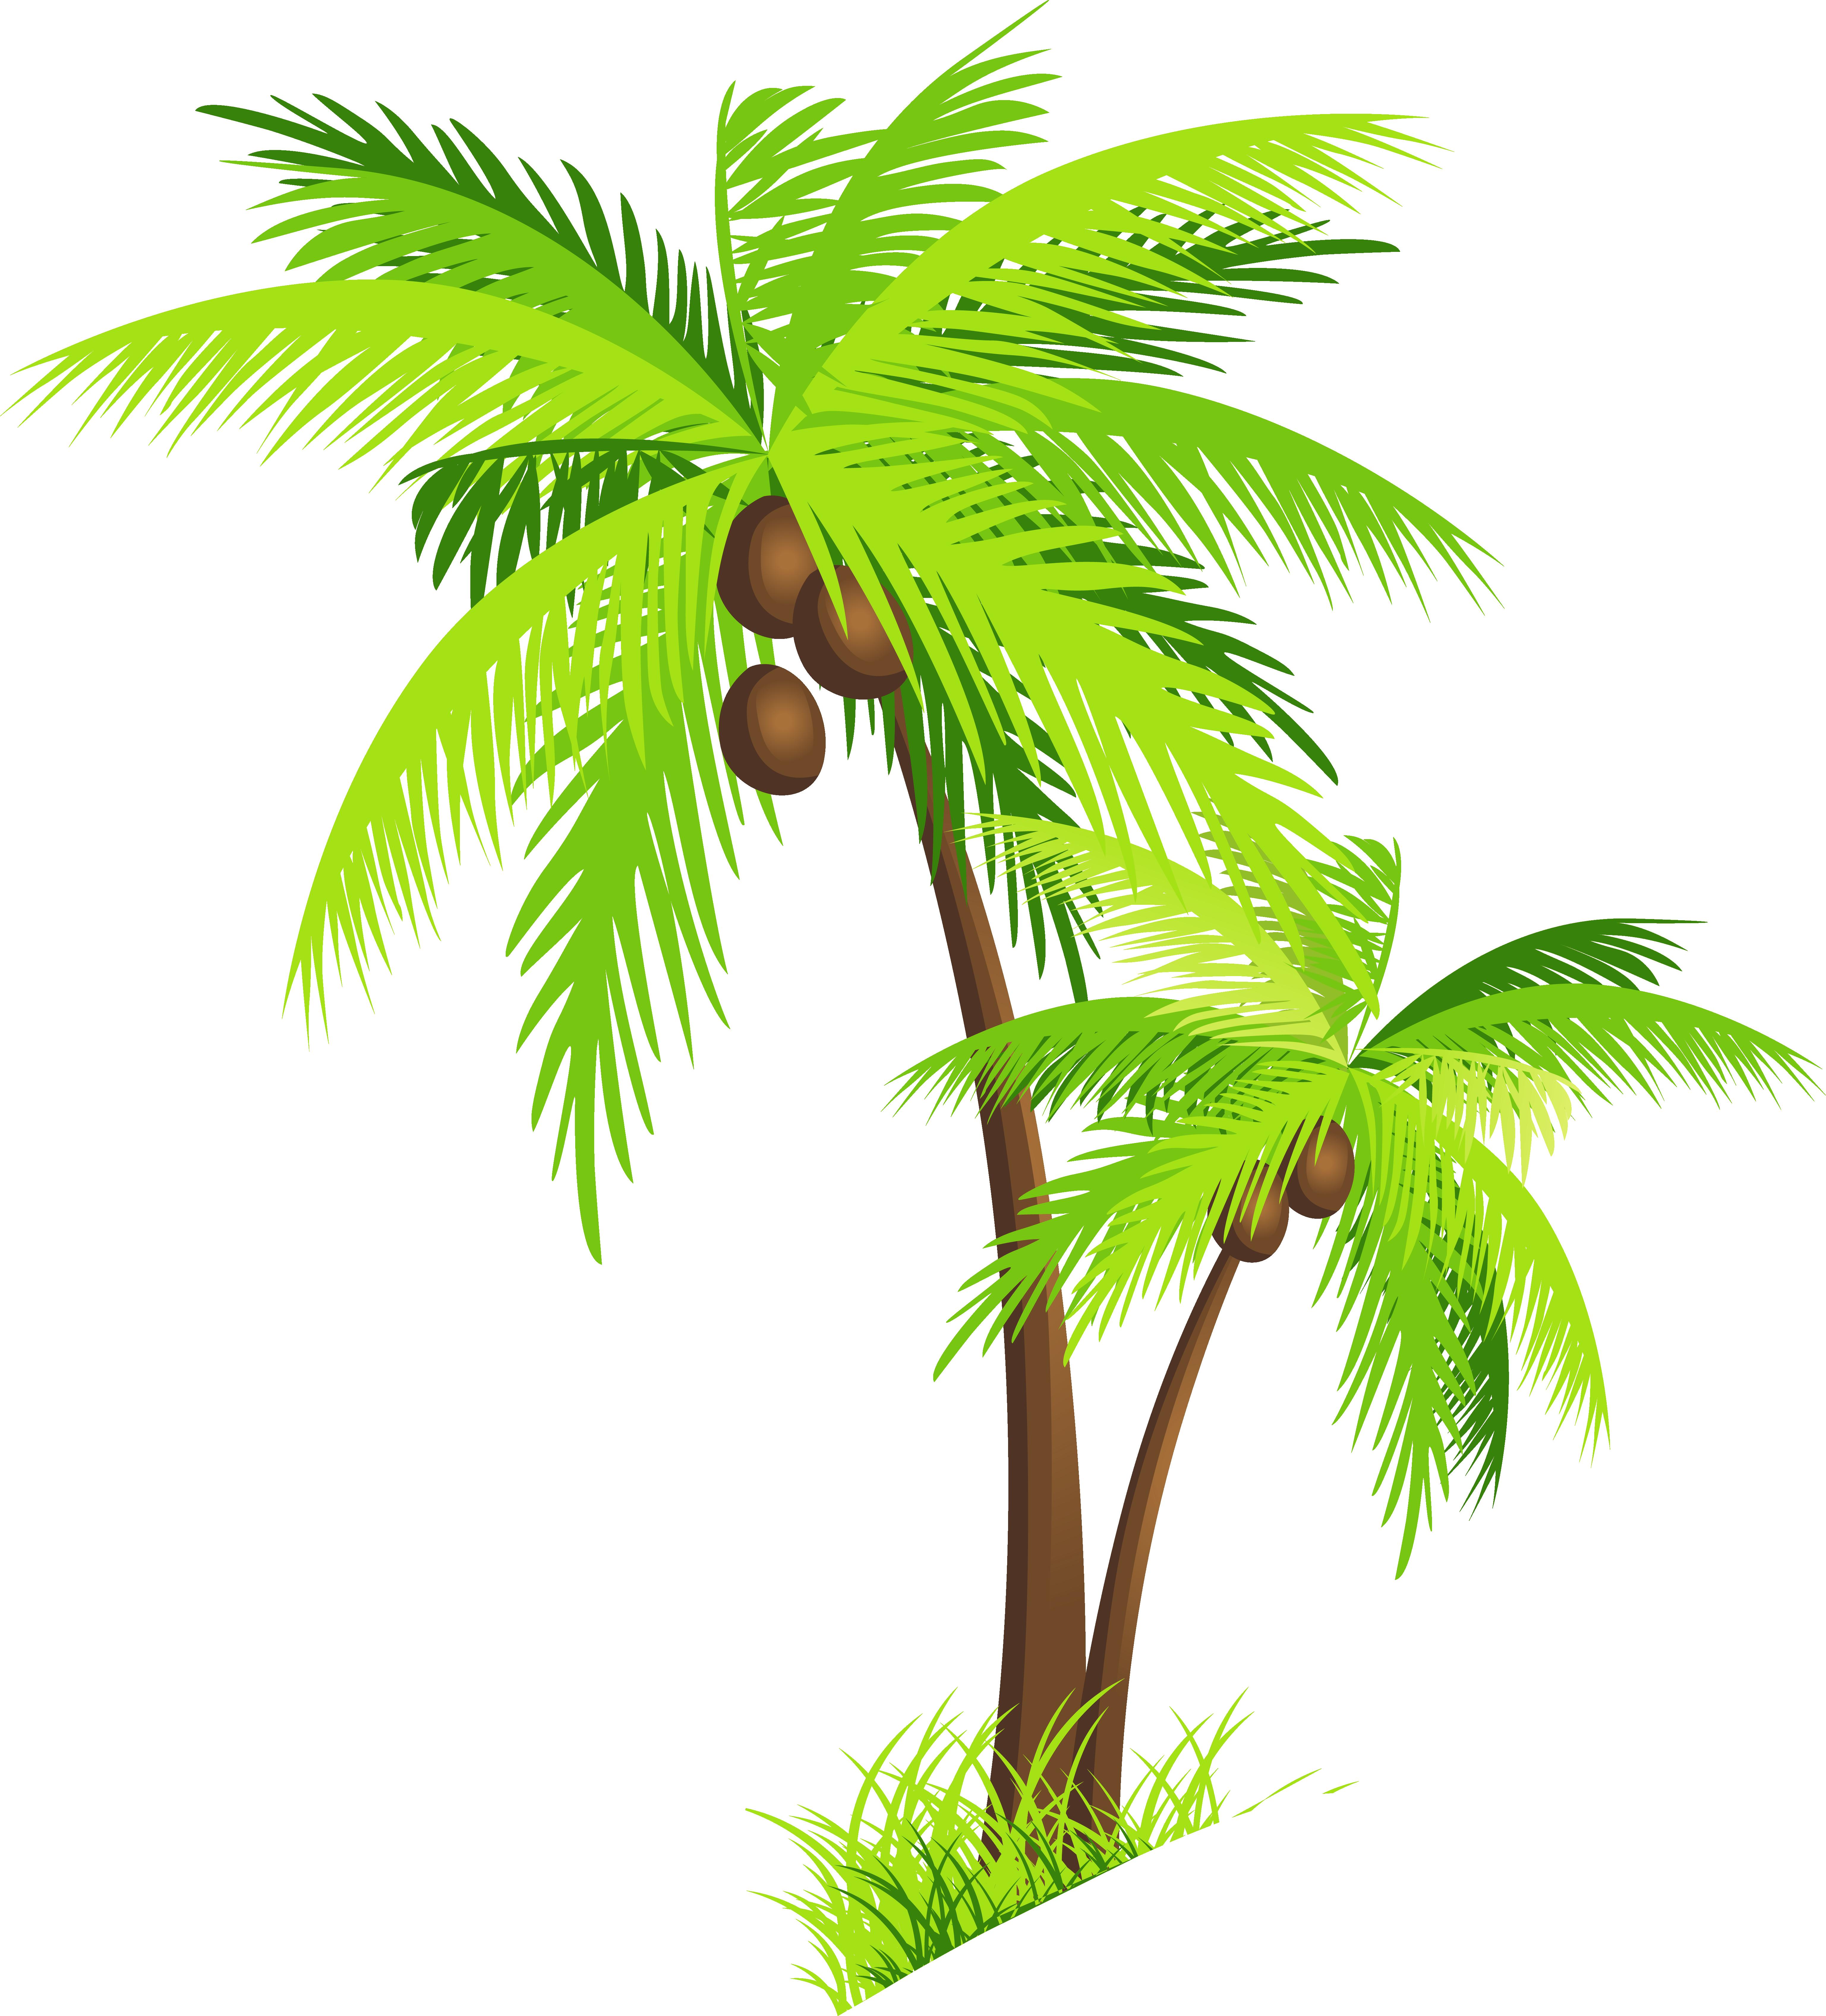 Coconut tree clipart png - . - Coconut Tree Clipart